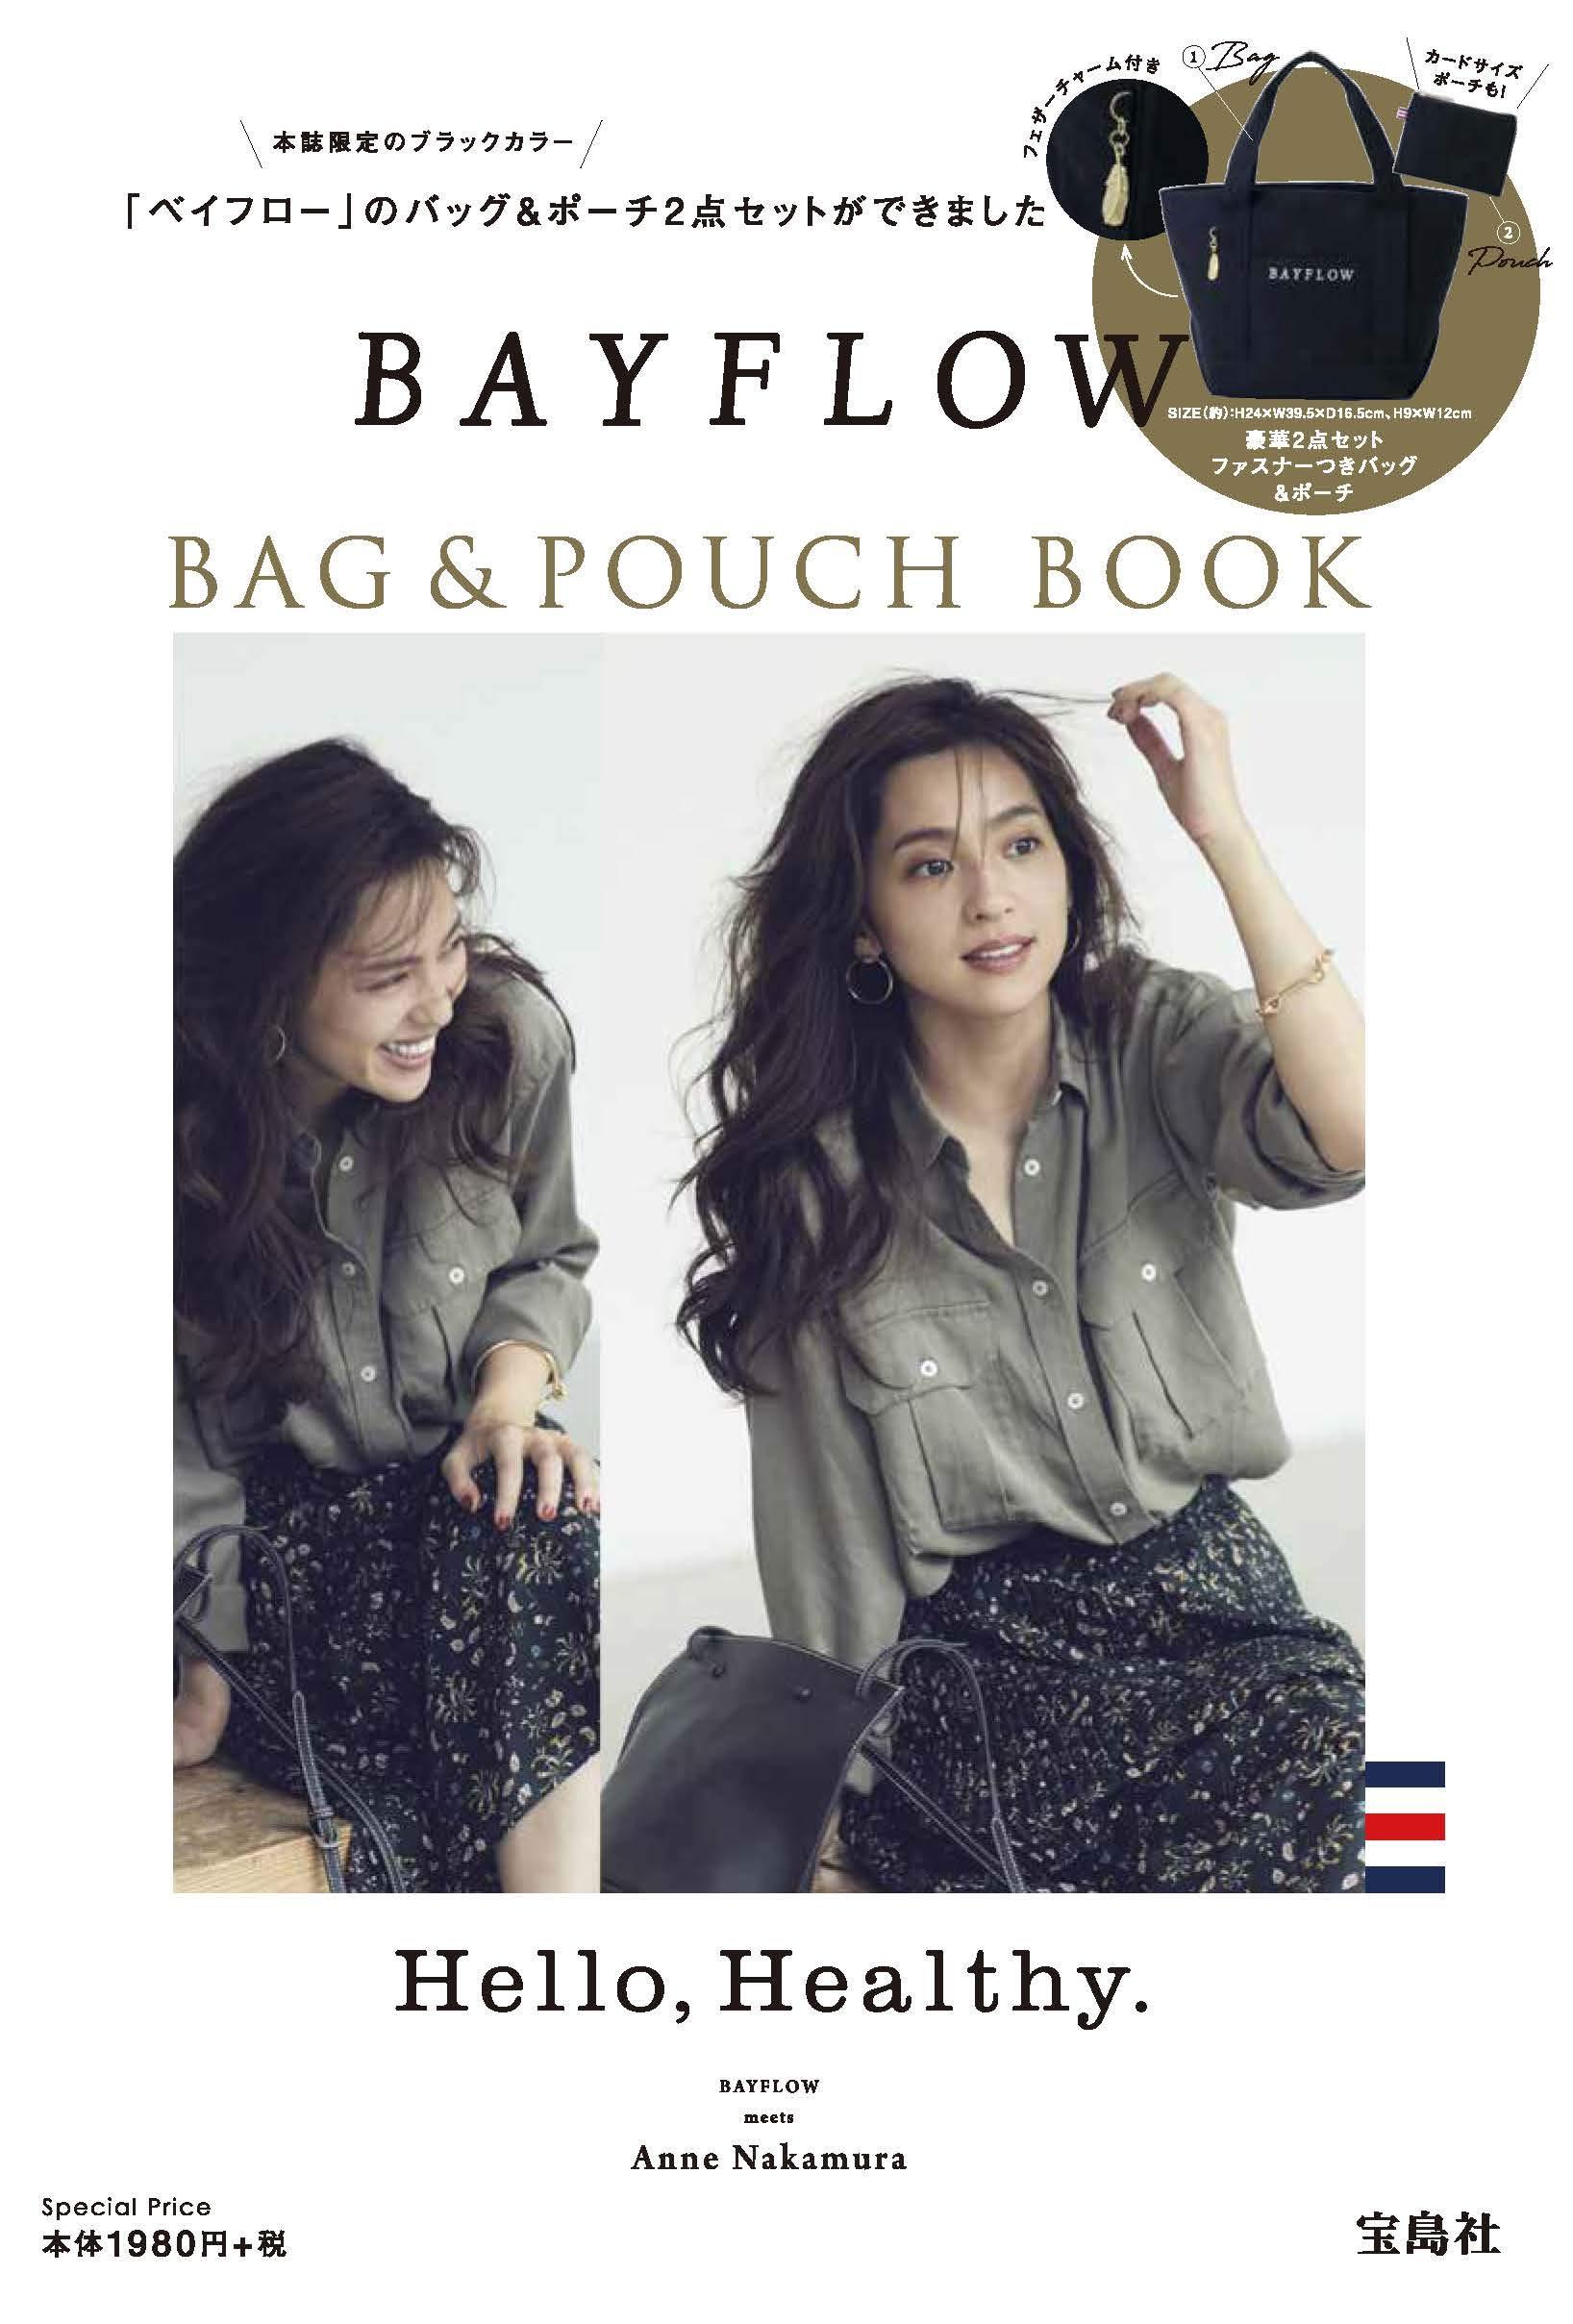 BAYFLOW BAG &POUCH BOOK